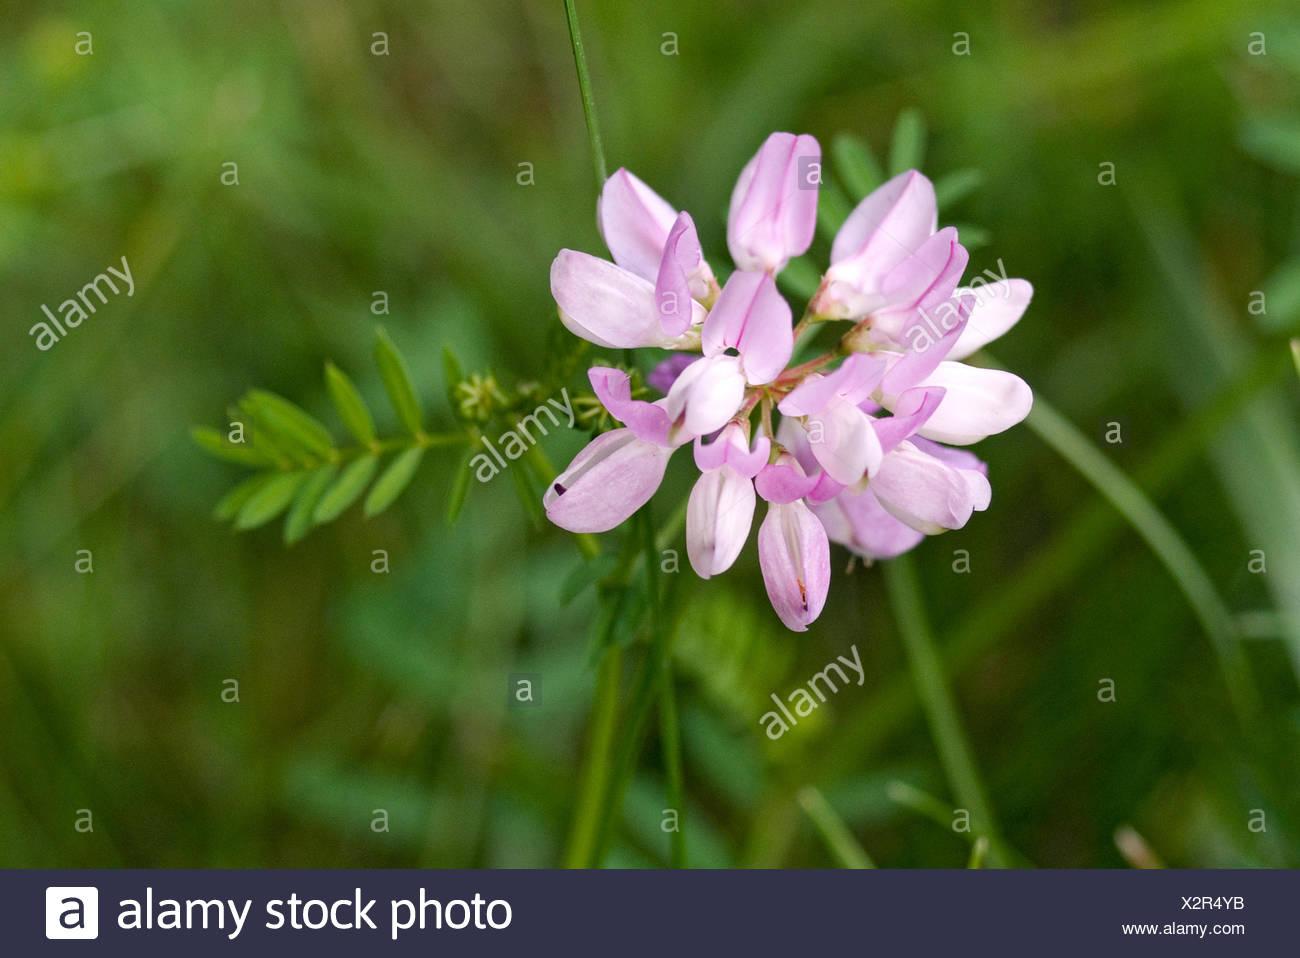 Crown vetch securigera varia close up of flower stock photo crown vetch securigera varia close up of flower izmirmasajfo